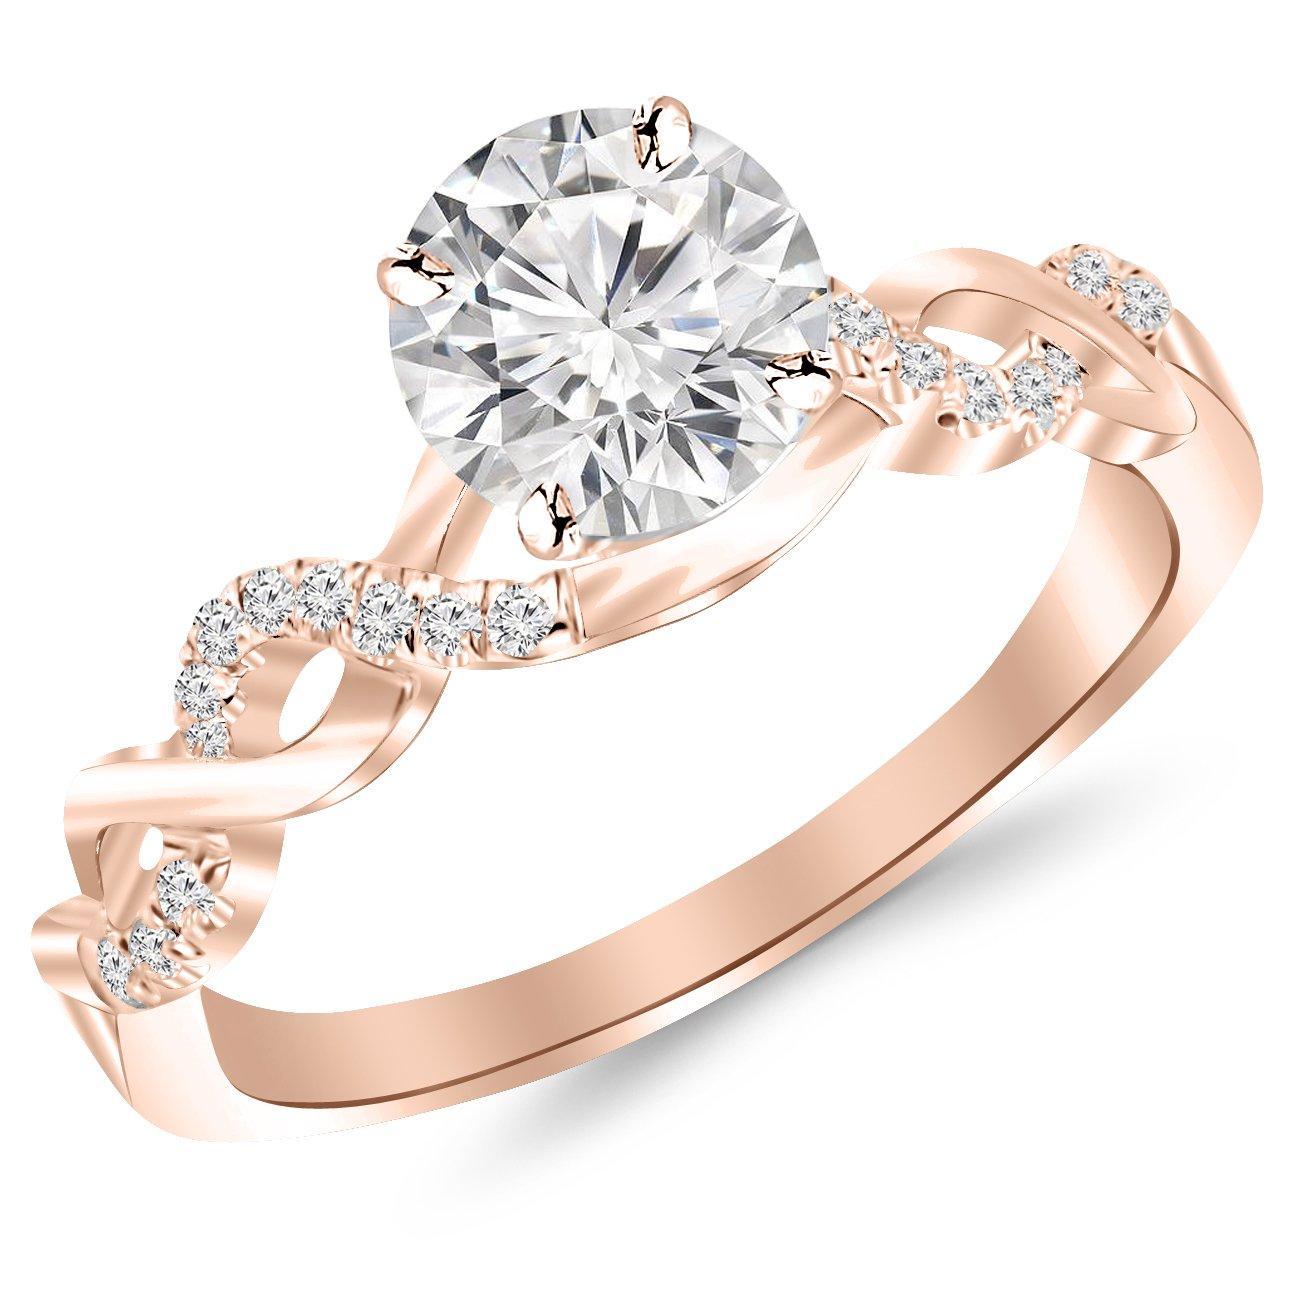 0.5 Carat Twisting Infinity Gold and Diamond Split Shank Pave Set Diamond Engagement Ring 14K Rose Gold with a 0.37 Carat J-K I2 Round Brilliant Cut/Shape Center